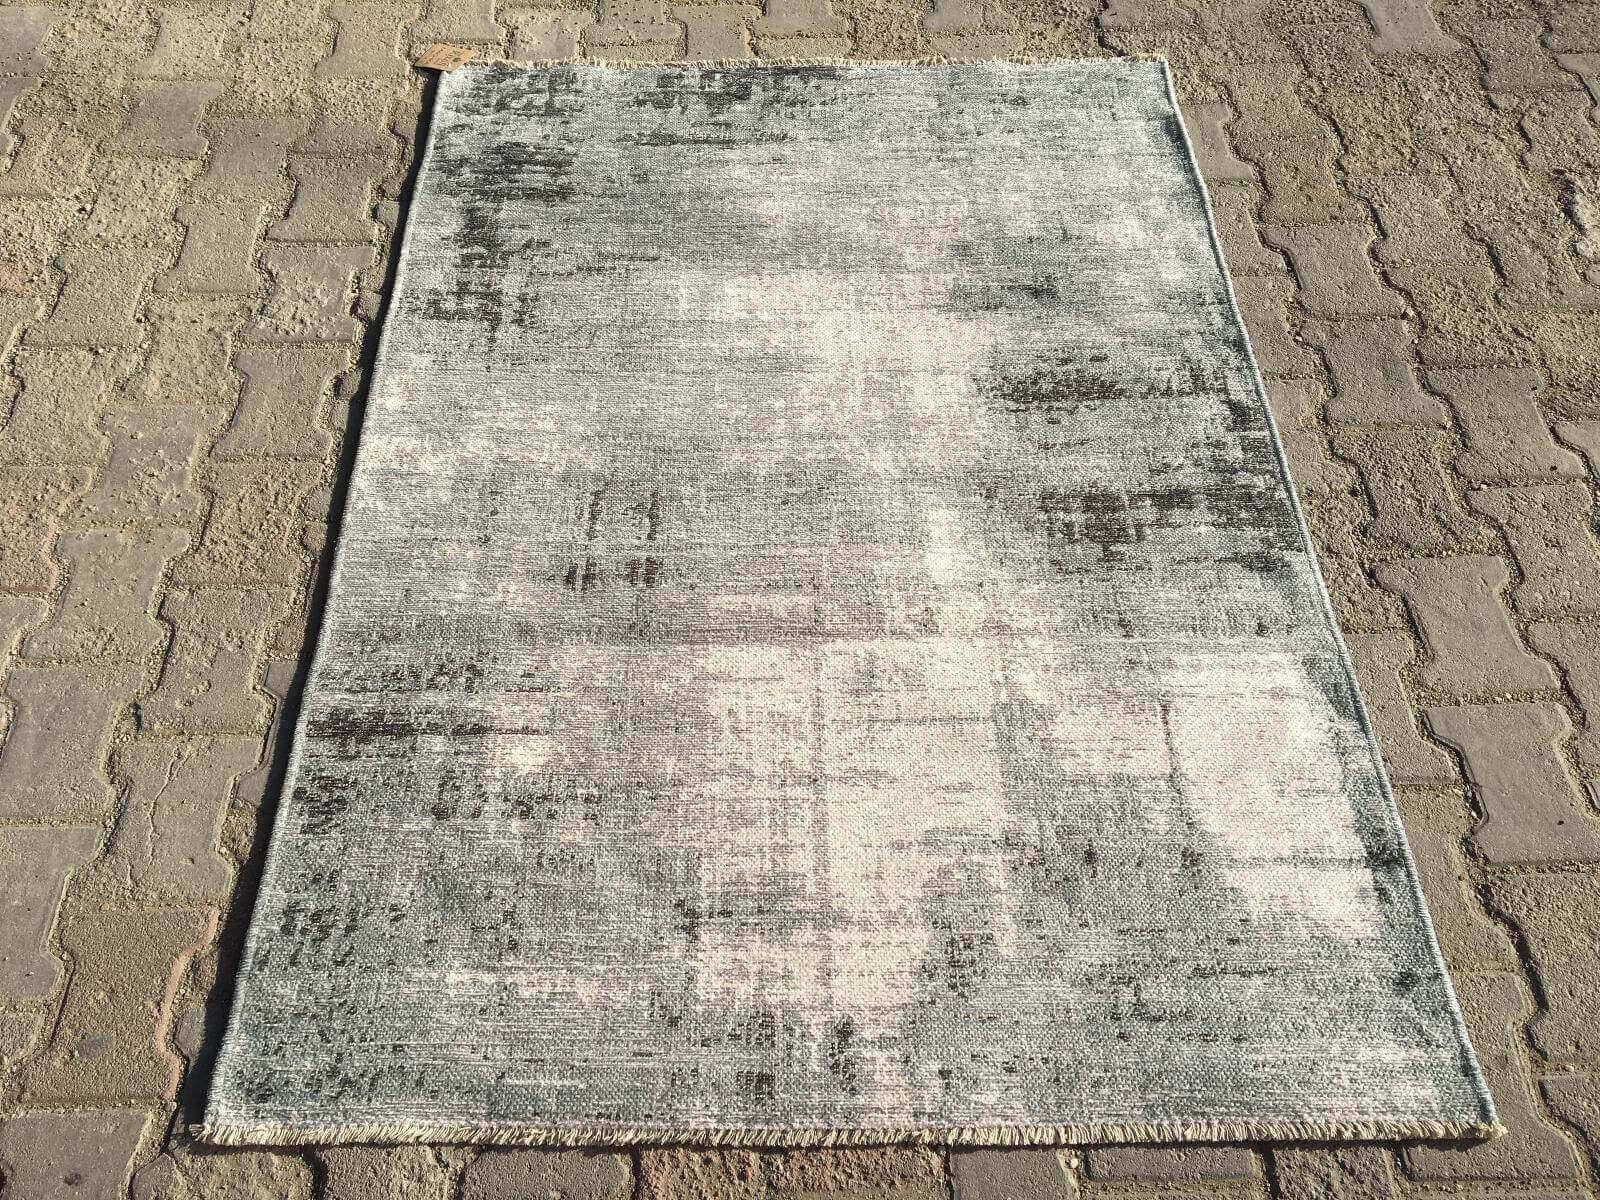 COTTON LÜX KİLİM GRİ ANTRASİT 120X180 Cotton Lux Kilim Dekoratif Kilim